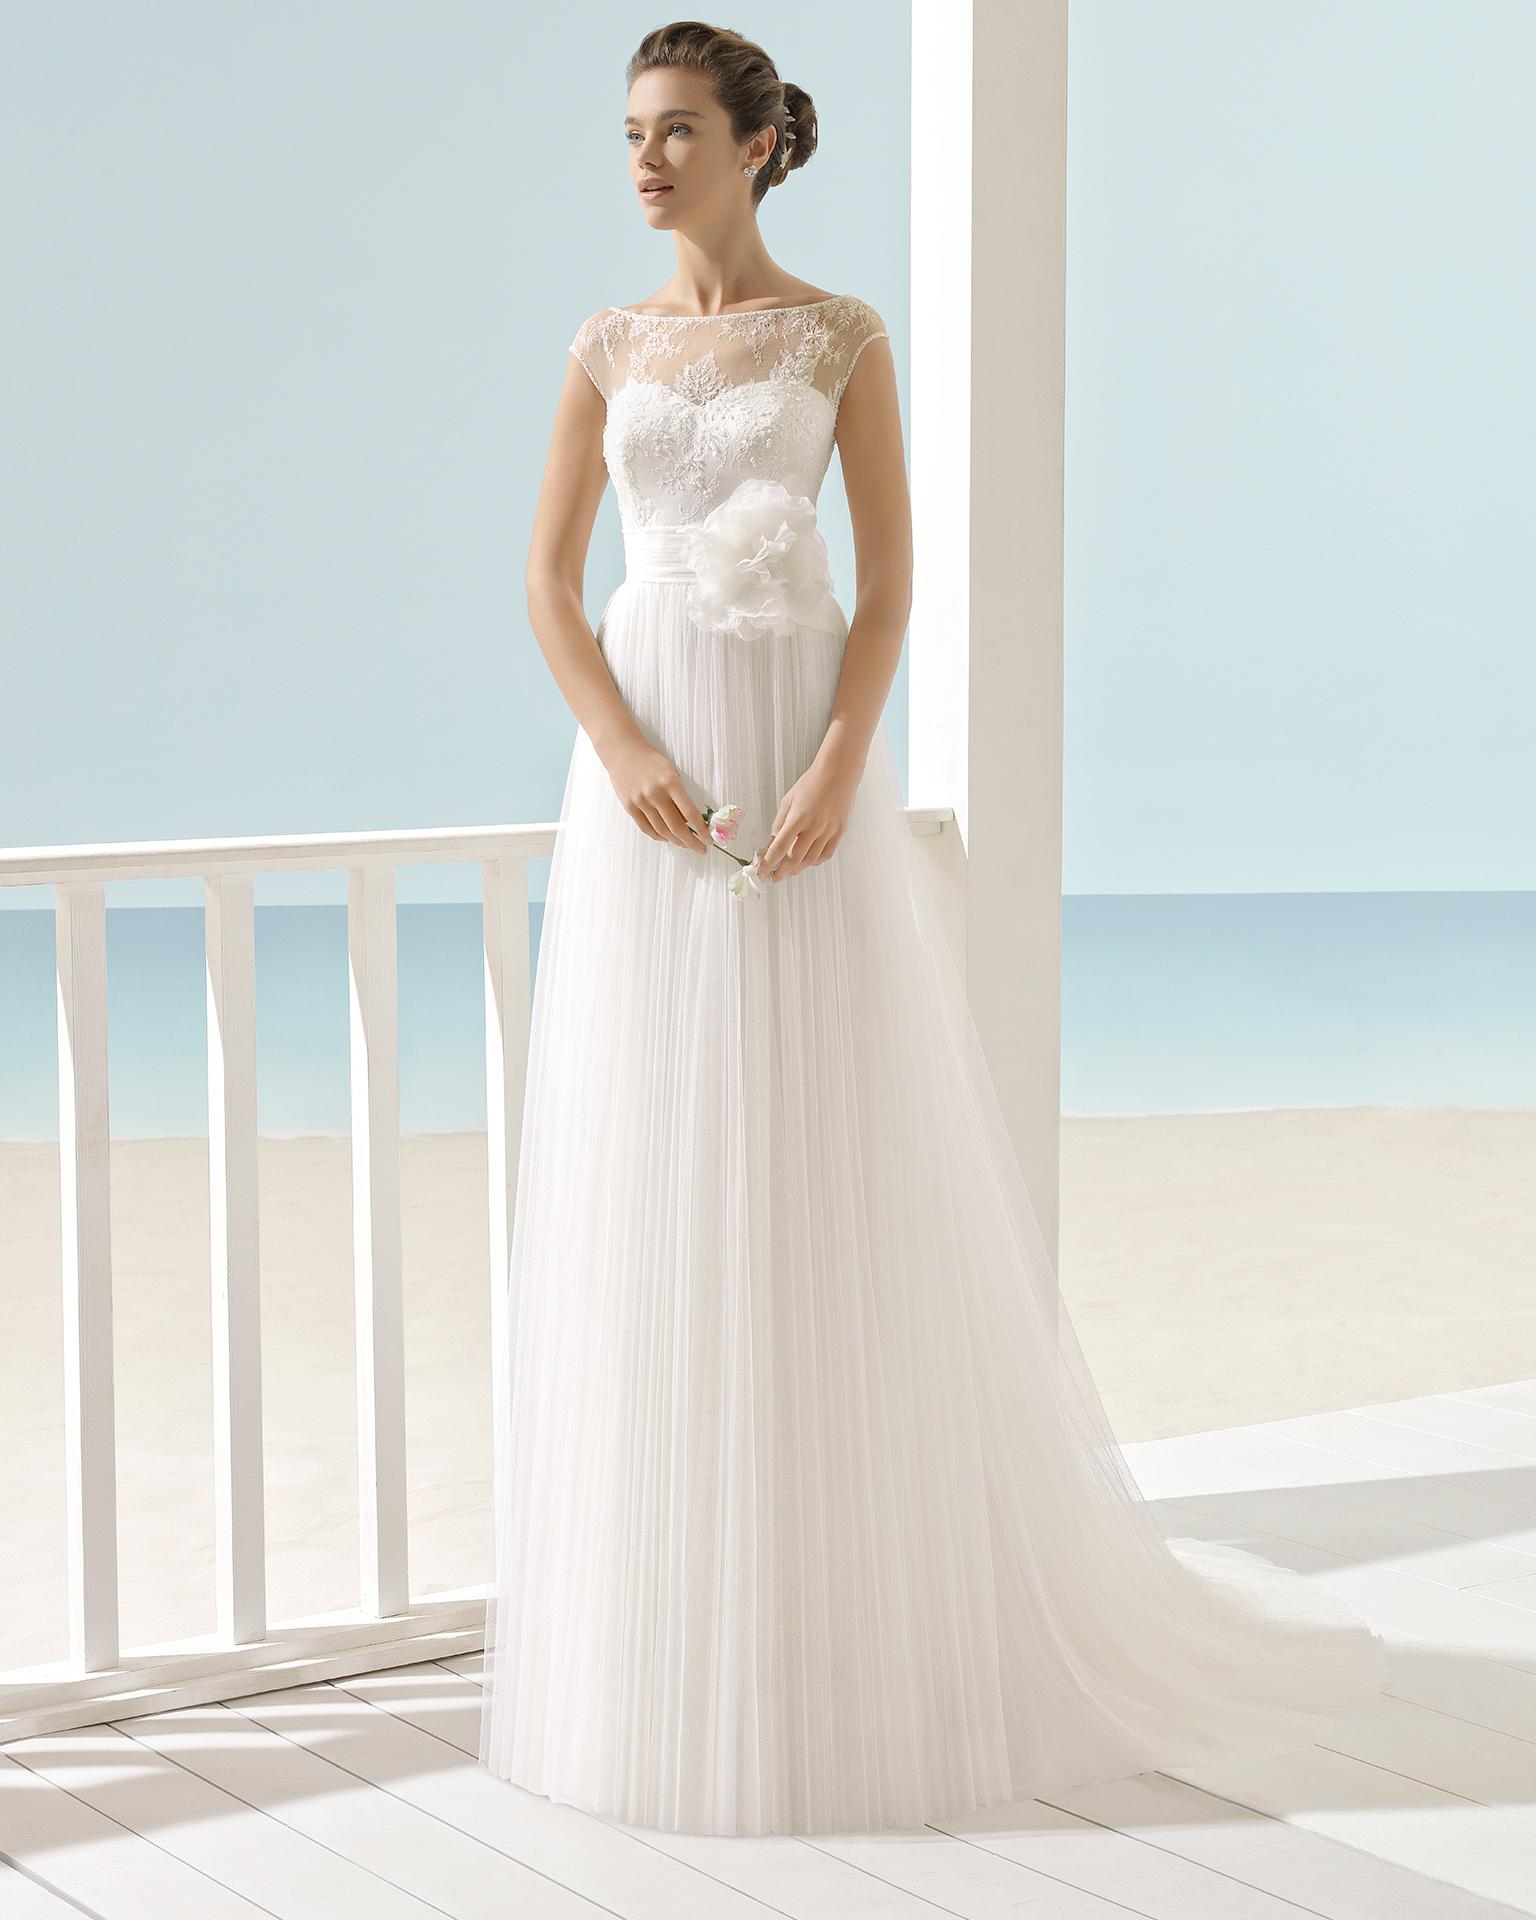 XIANA wedding dress - Aire Barcelona Beach Wedding 2017